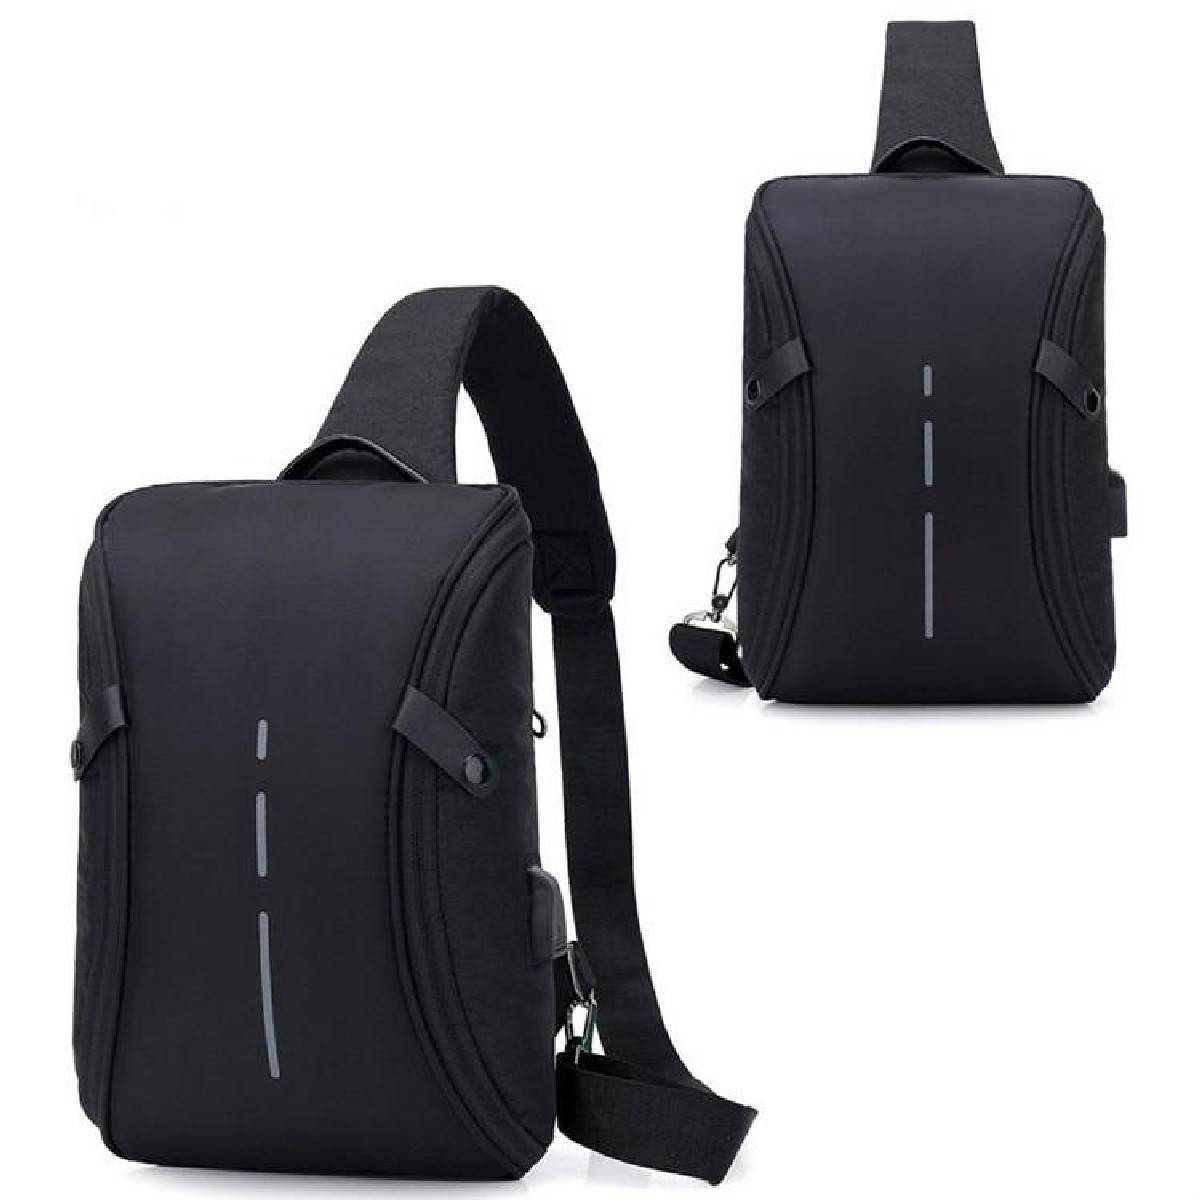 Men Crossbody Sling Bag Shoulder bag Premium Canvas Multi Compartment Chest Pack